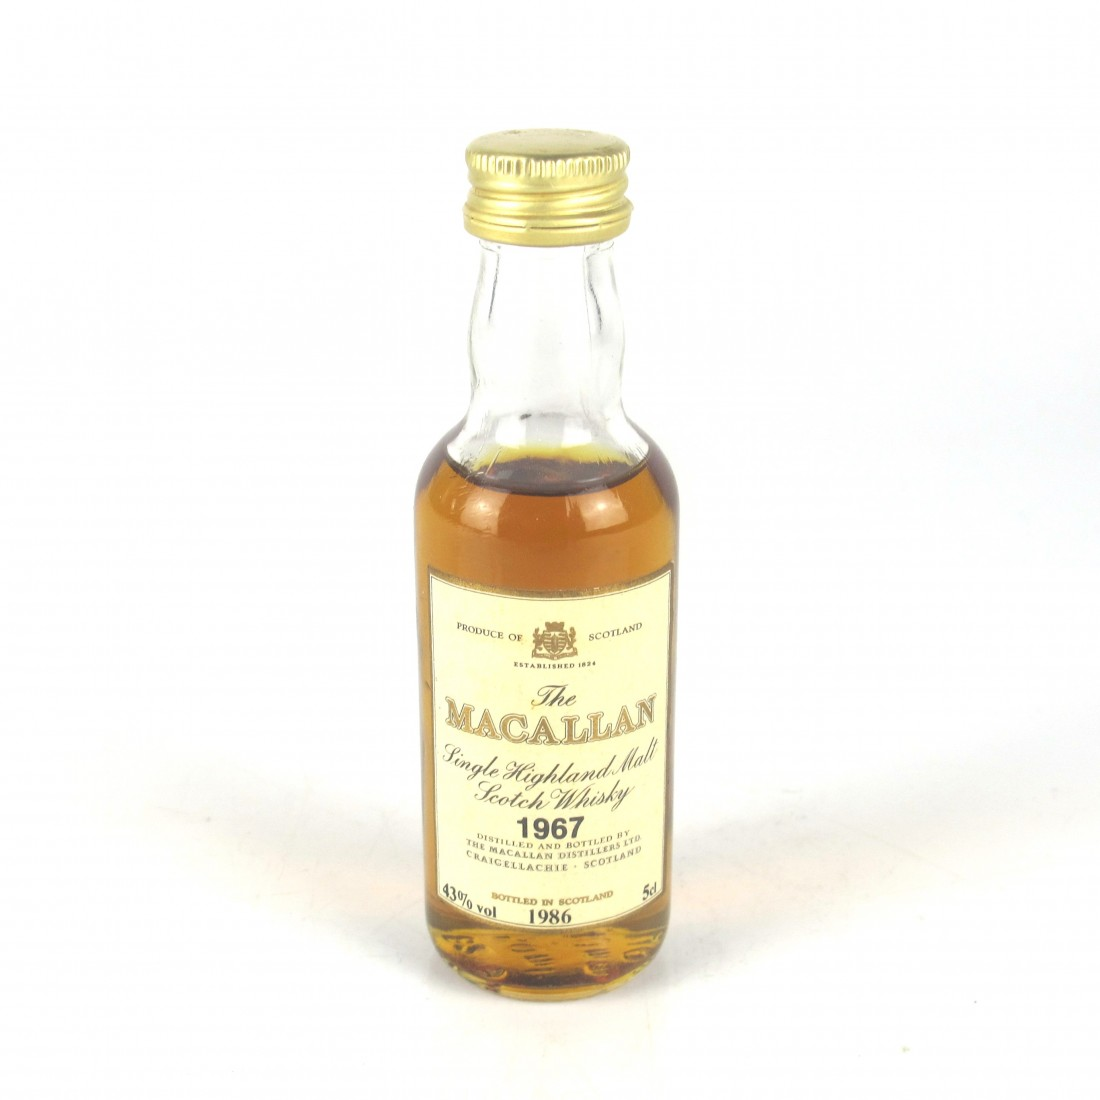 Macallan 18 Year Old 1967 Miniature 5cl